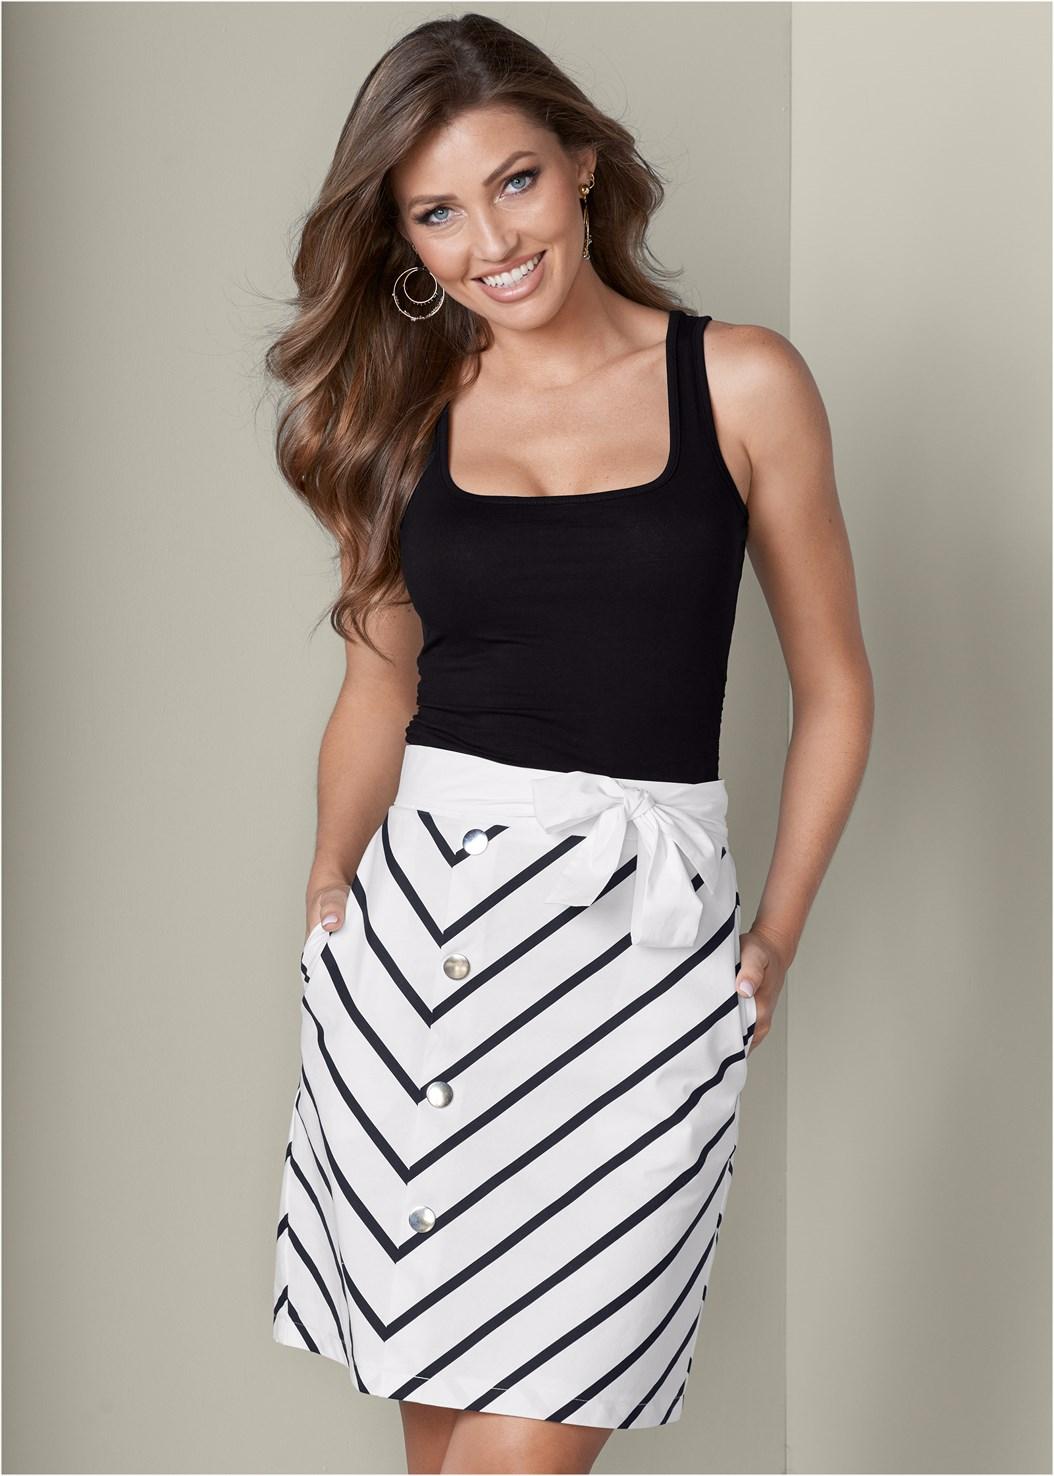 Belted Stripe Skirt,Square Neck Tank Top,High Heel Strappy Sandals,Beaded Hoop Earrings